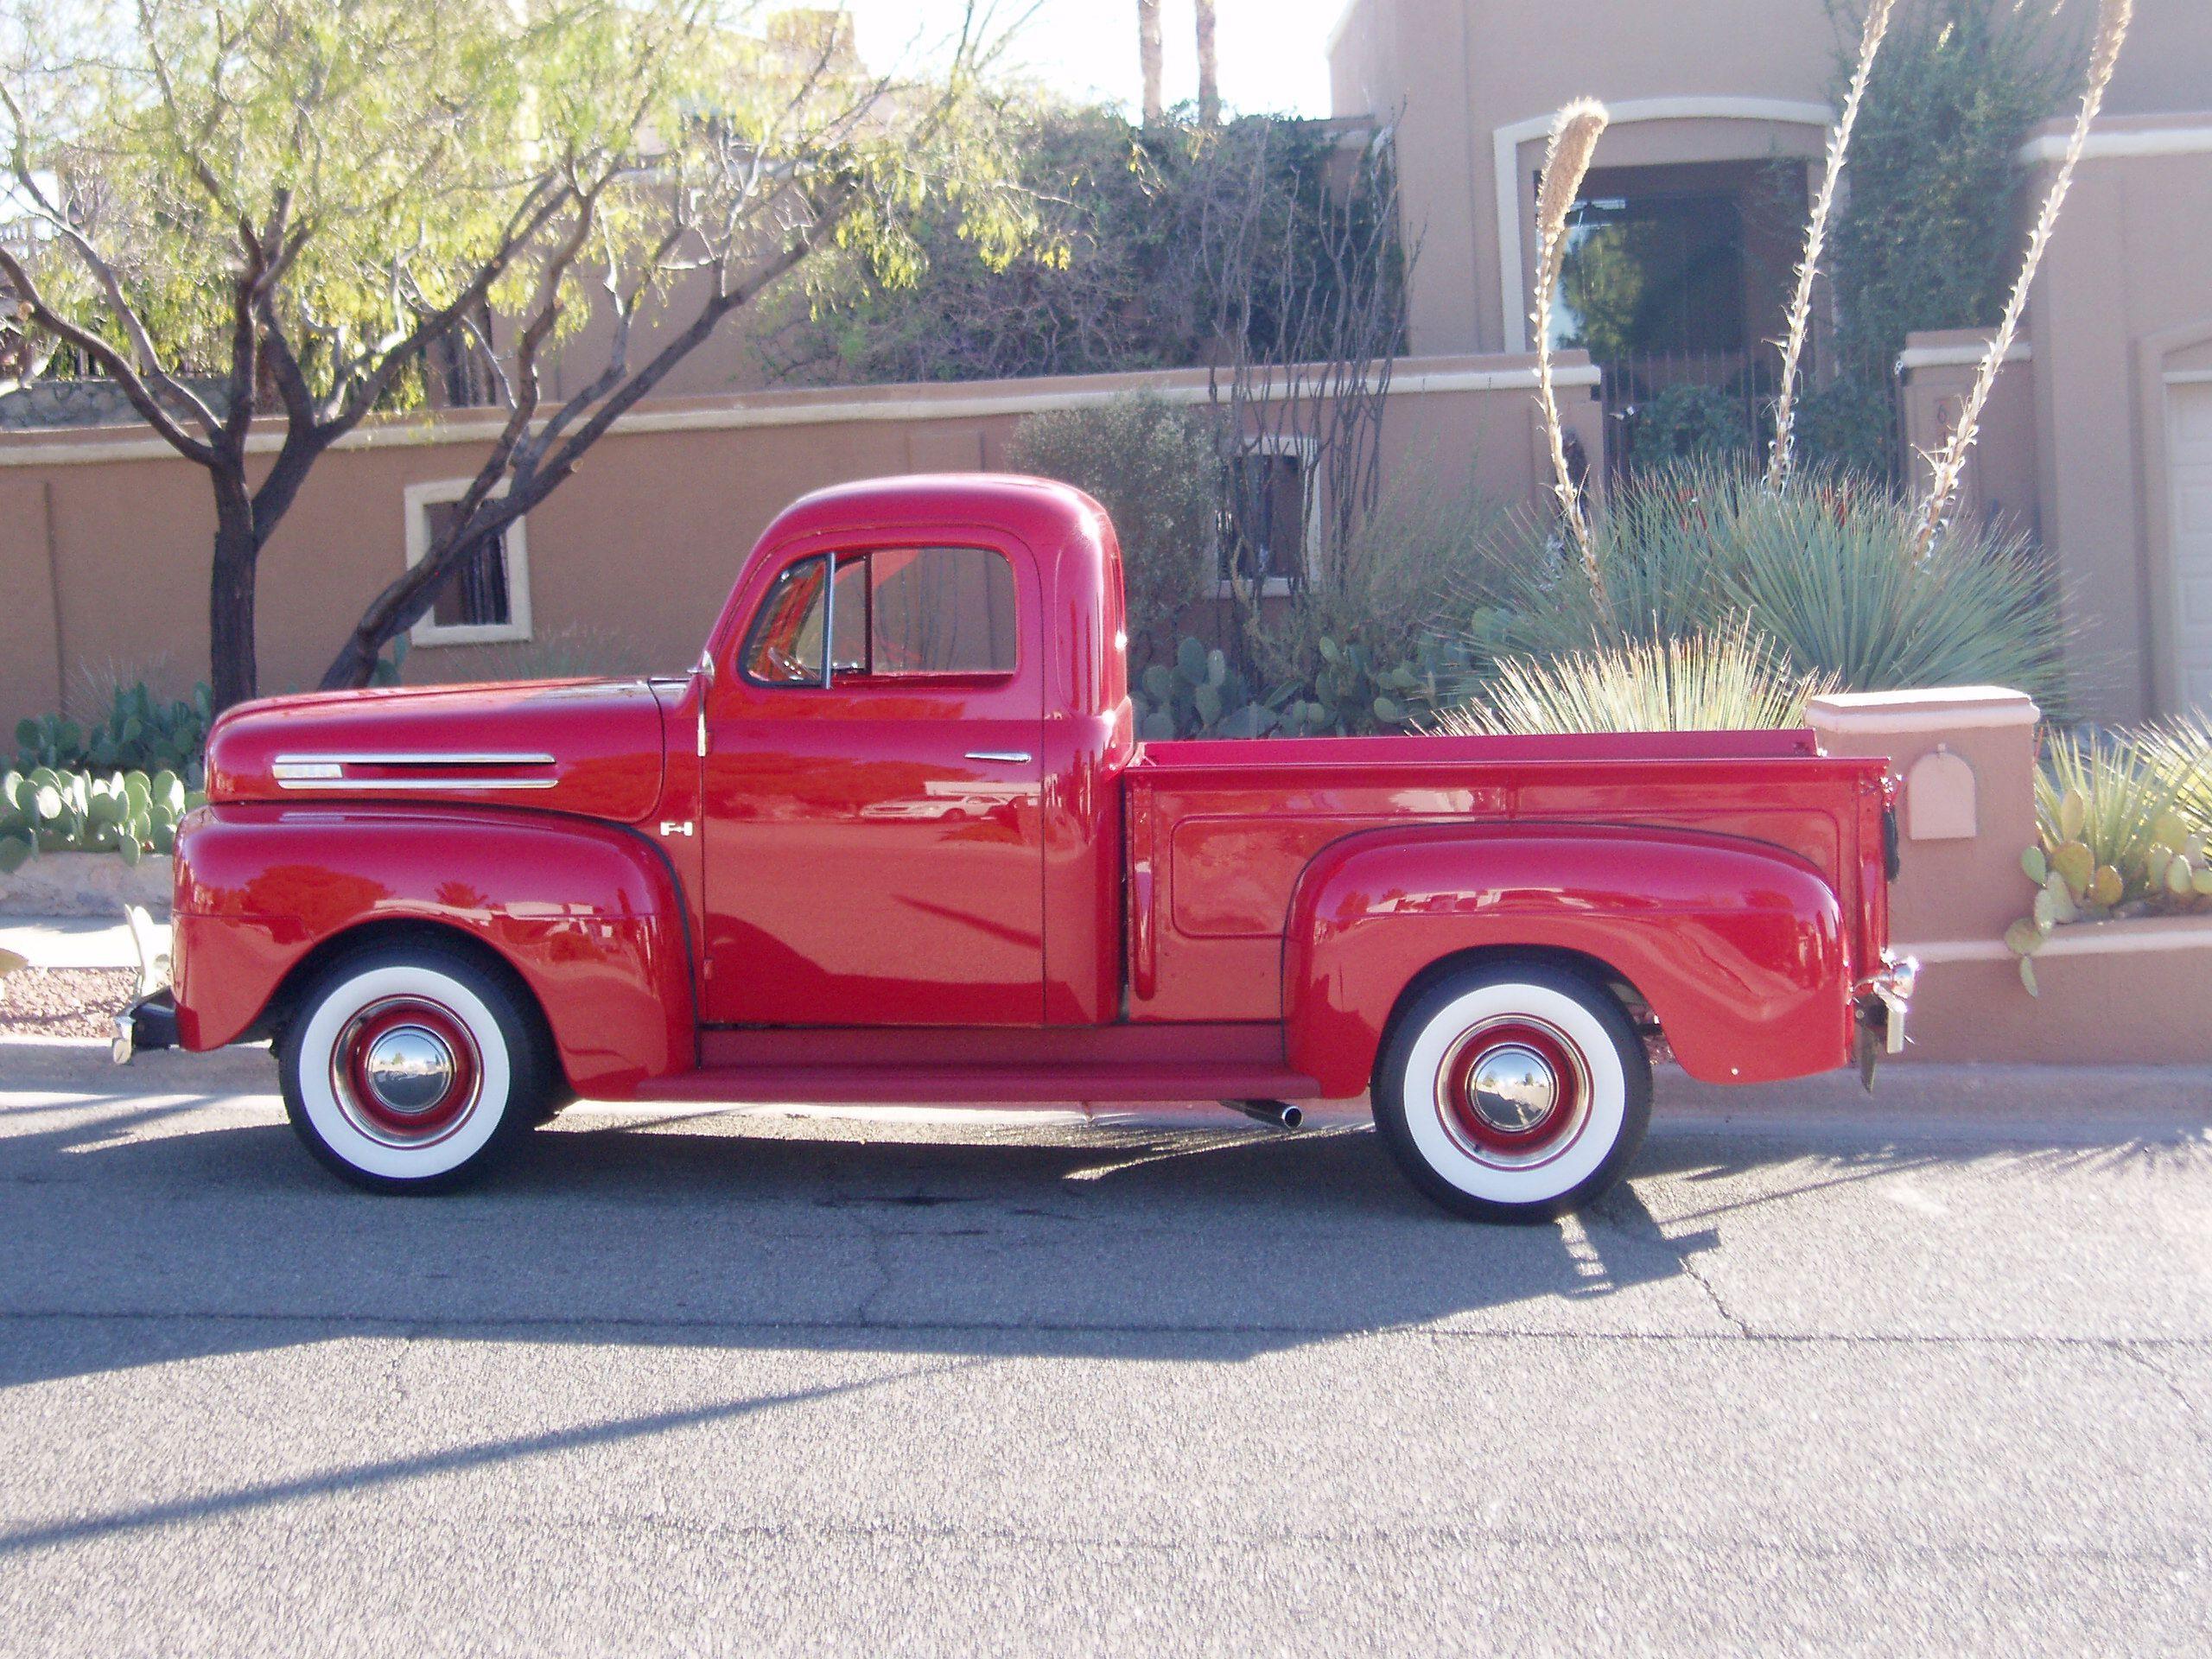 1950 Ford Truck | Resto-Rodding my 1950 Ford F-1 | FOMOCO | Pinterest